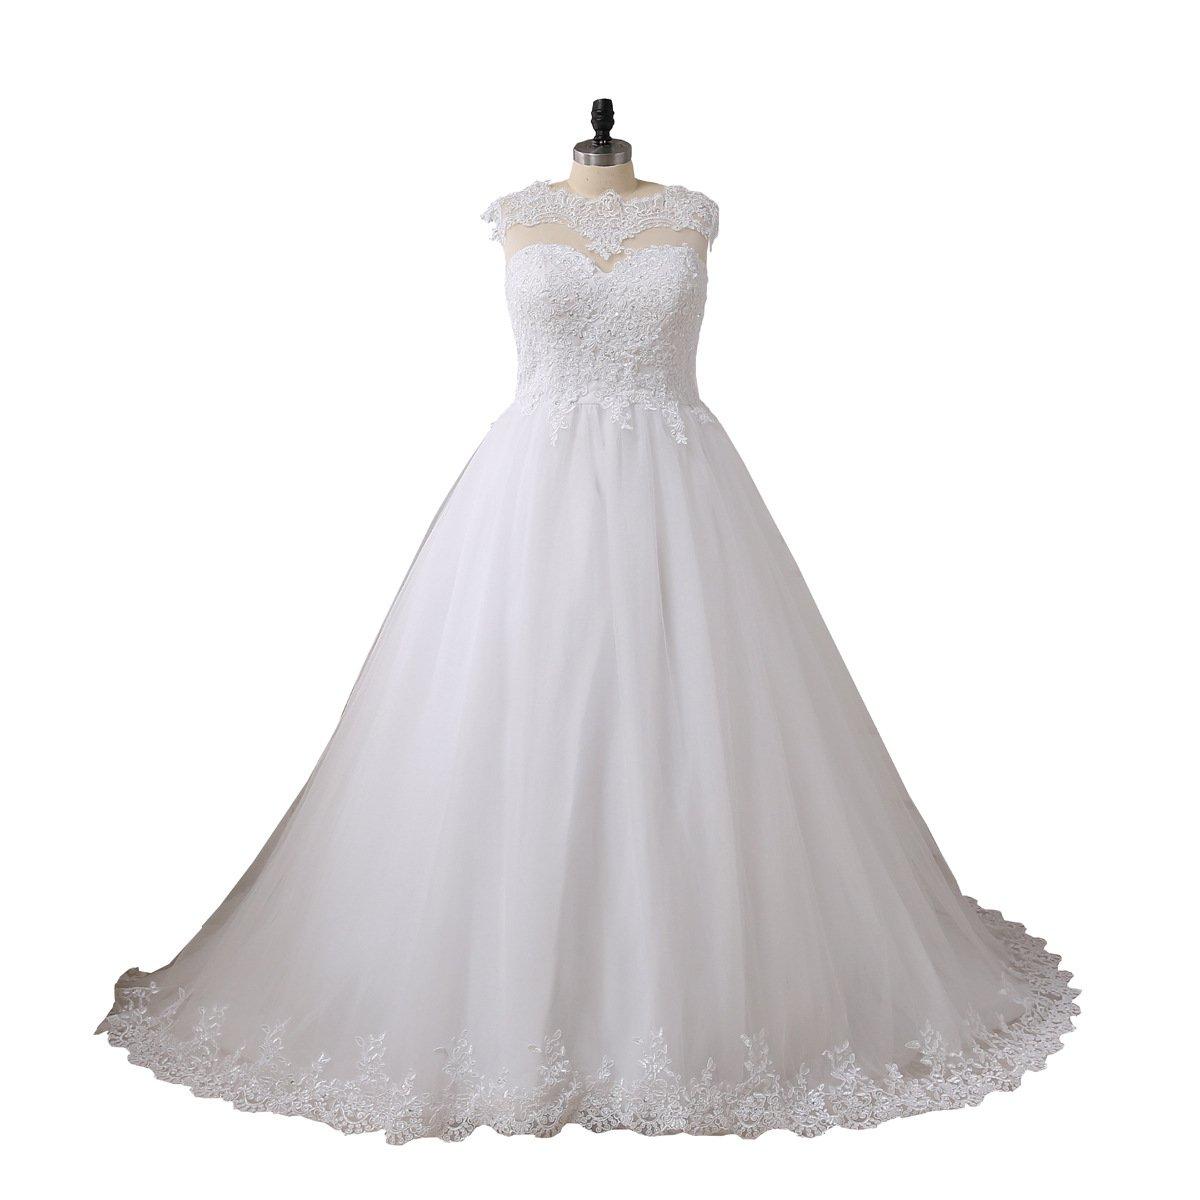 YIPEISHA Women\'s Plus Size Wedding Dresses Applique Beads Wedding Dress for  Bridal